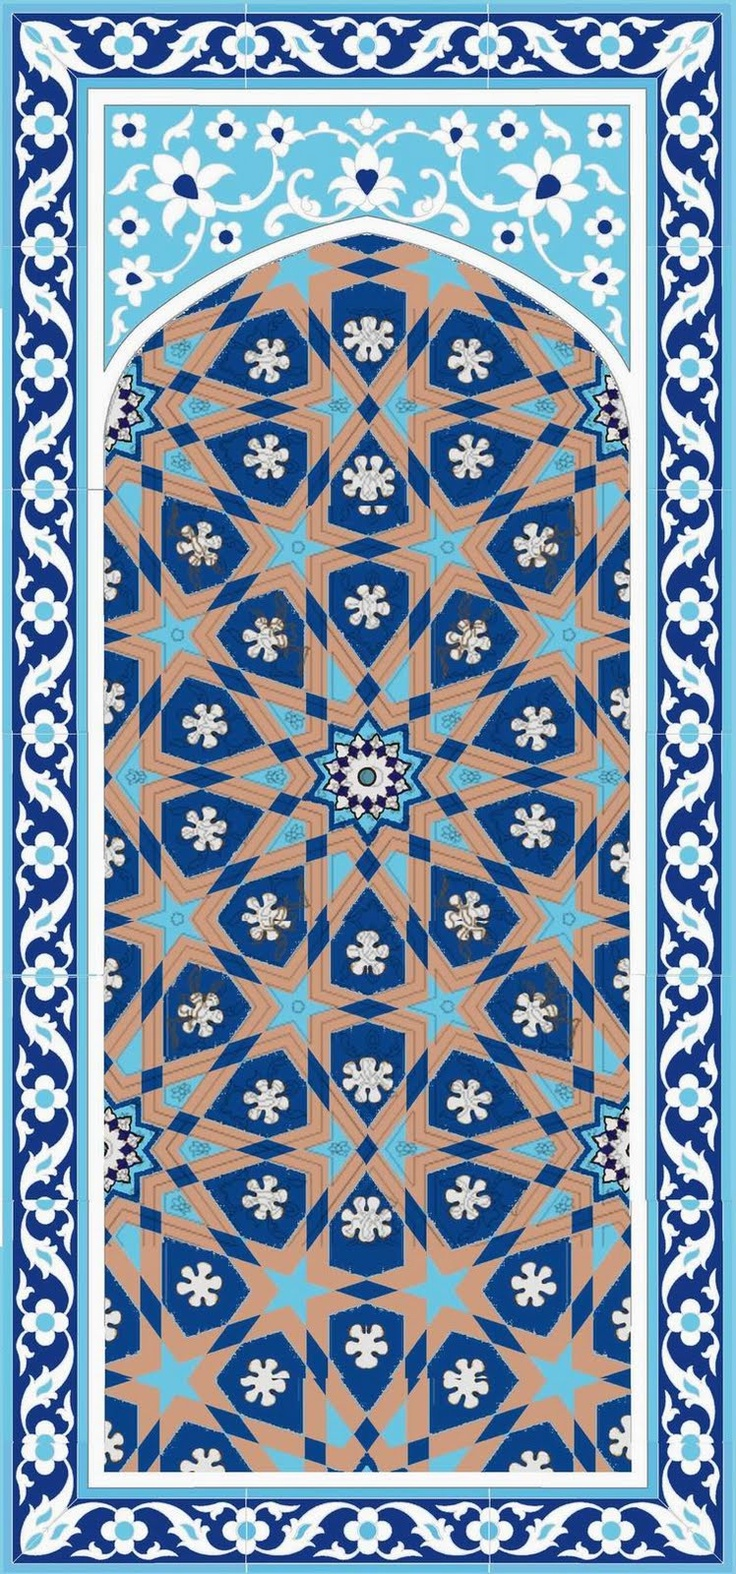 110 best islamic patterns images on Pinterest